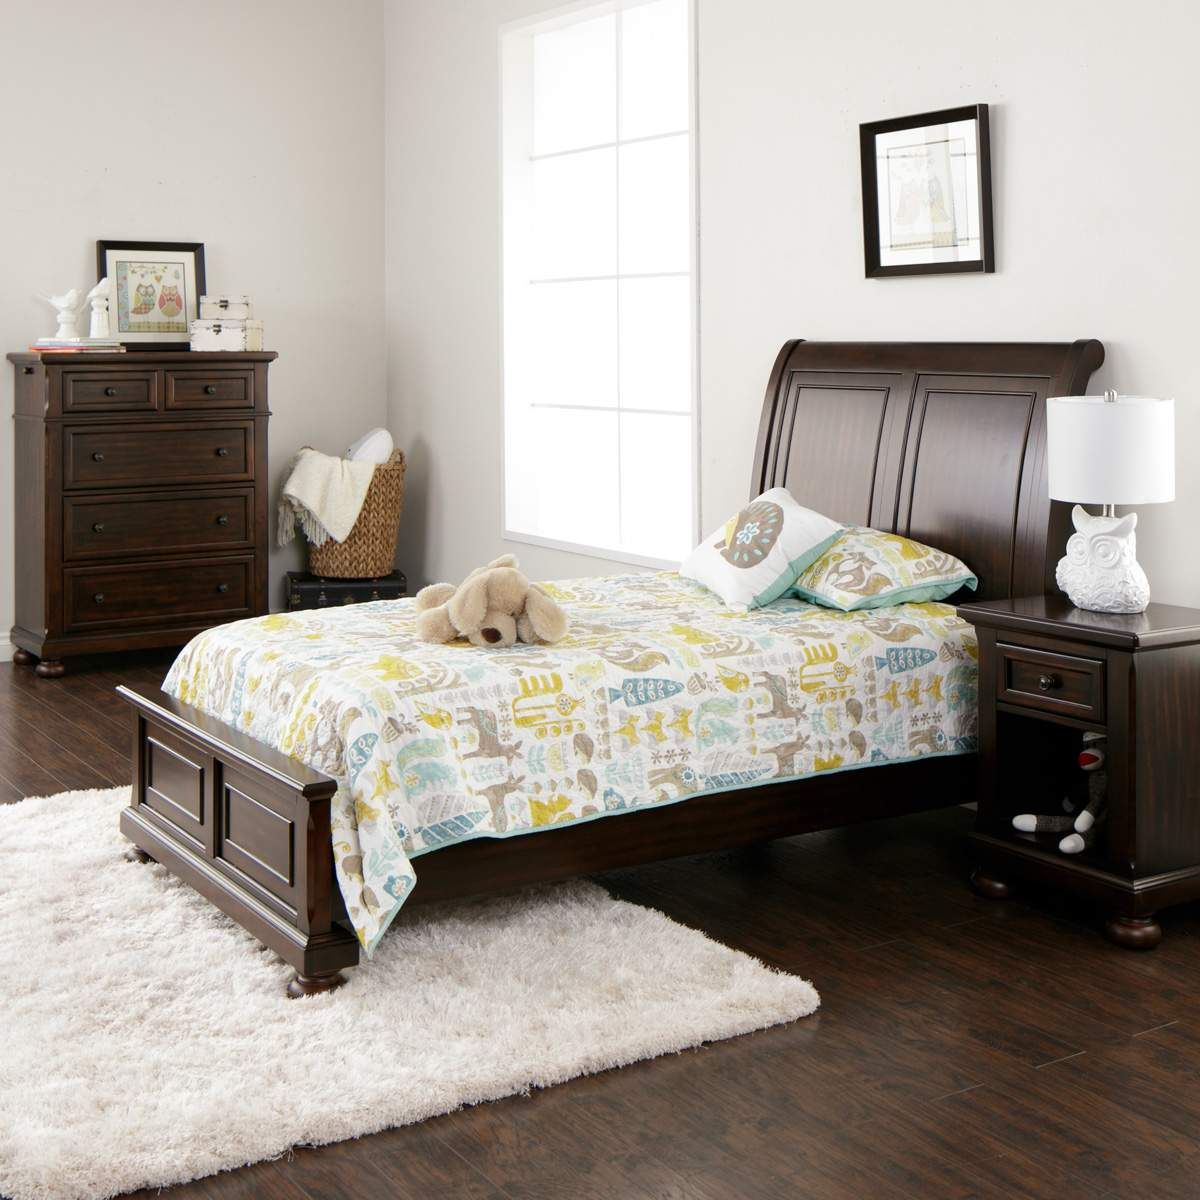 cumberland bedroom sets bedroom furniture on Cheap Childrens Bedroom Furniture Sets id=74672